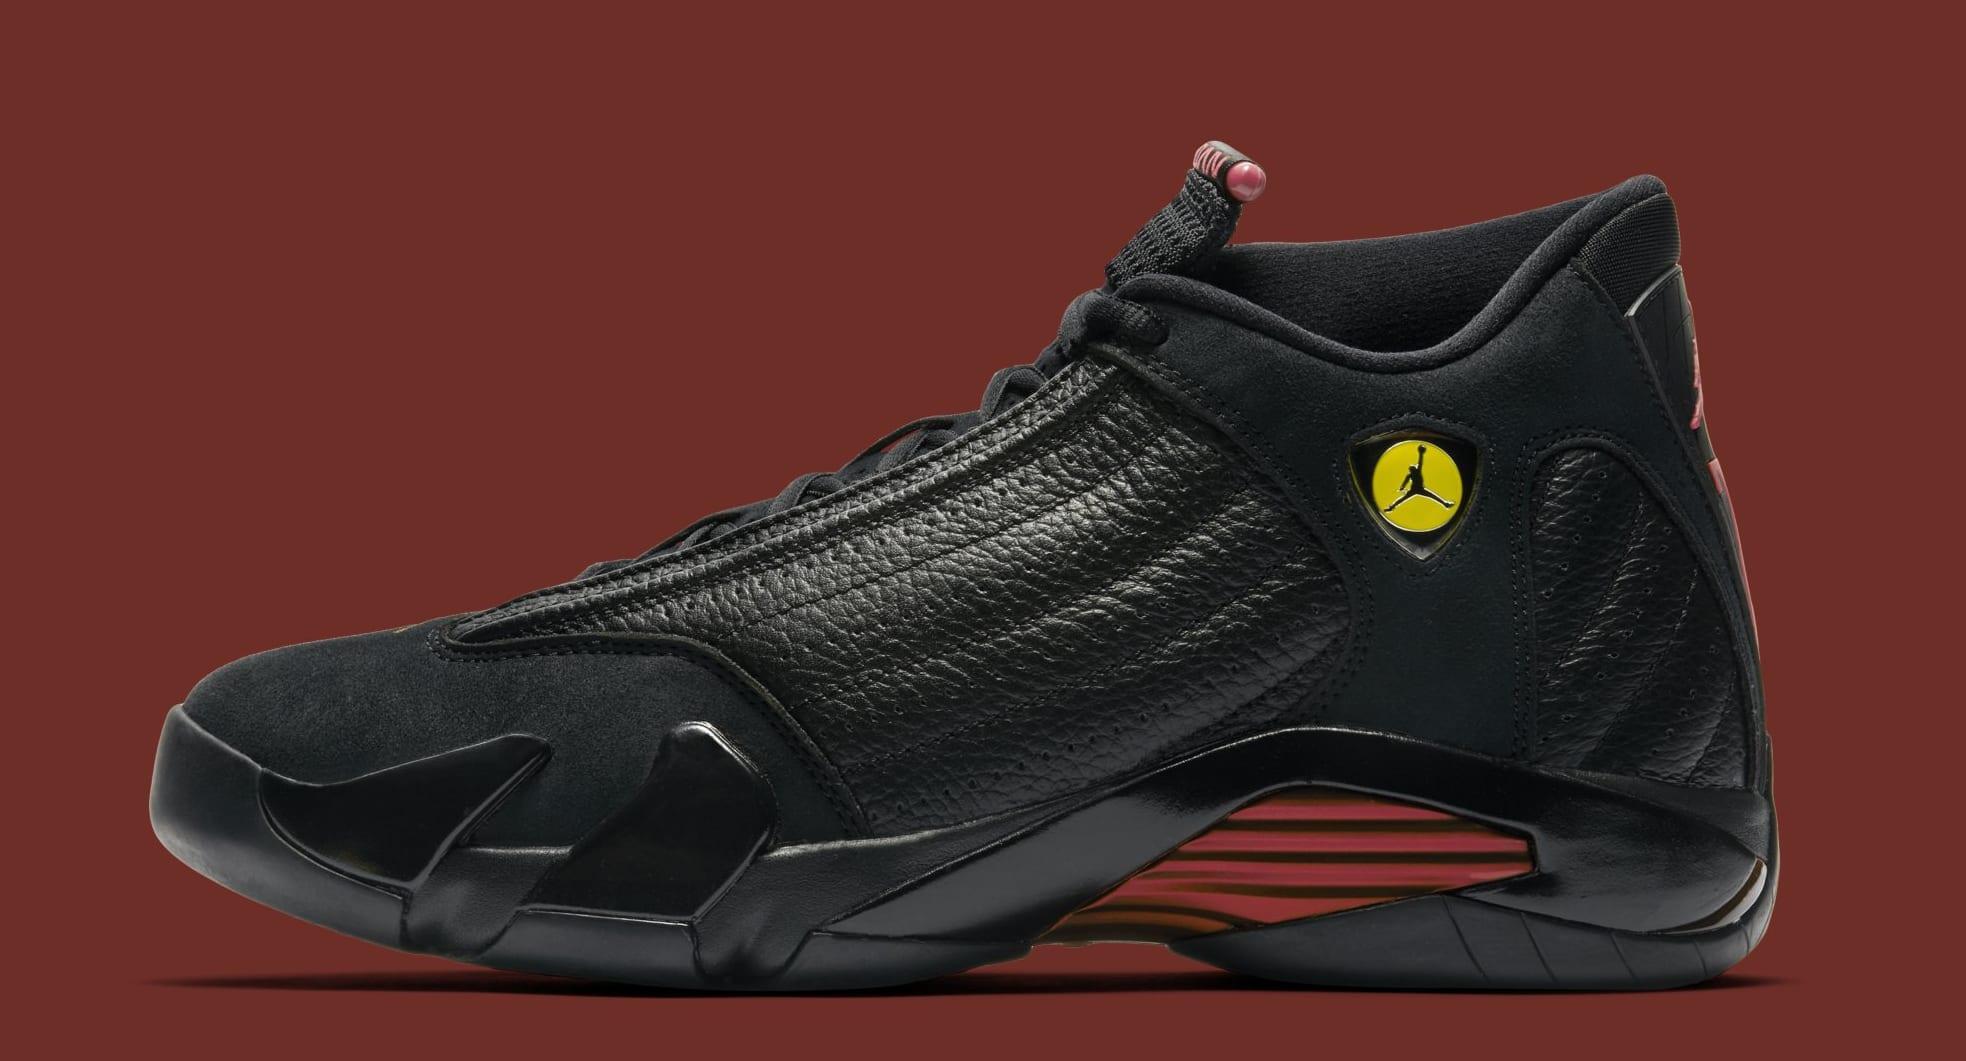 Air Jordan 14 Sneakers Air Jordan Xiv Last Shot Le Site De La Sneaker Women Air Jordan 14 Jordan Sho